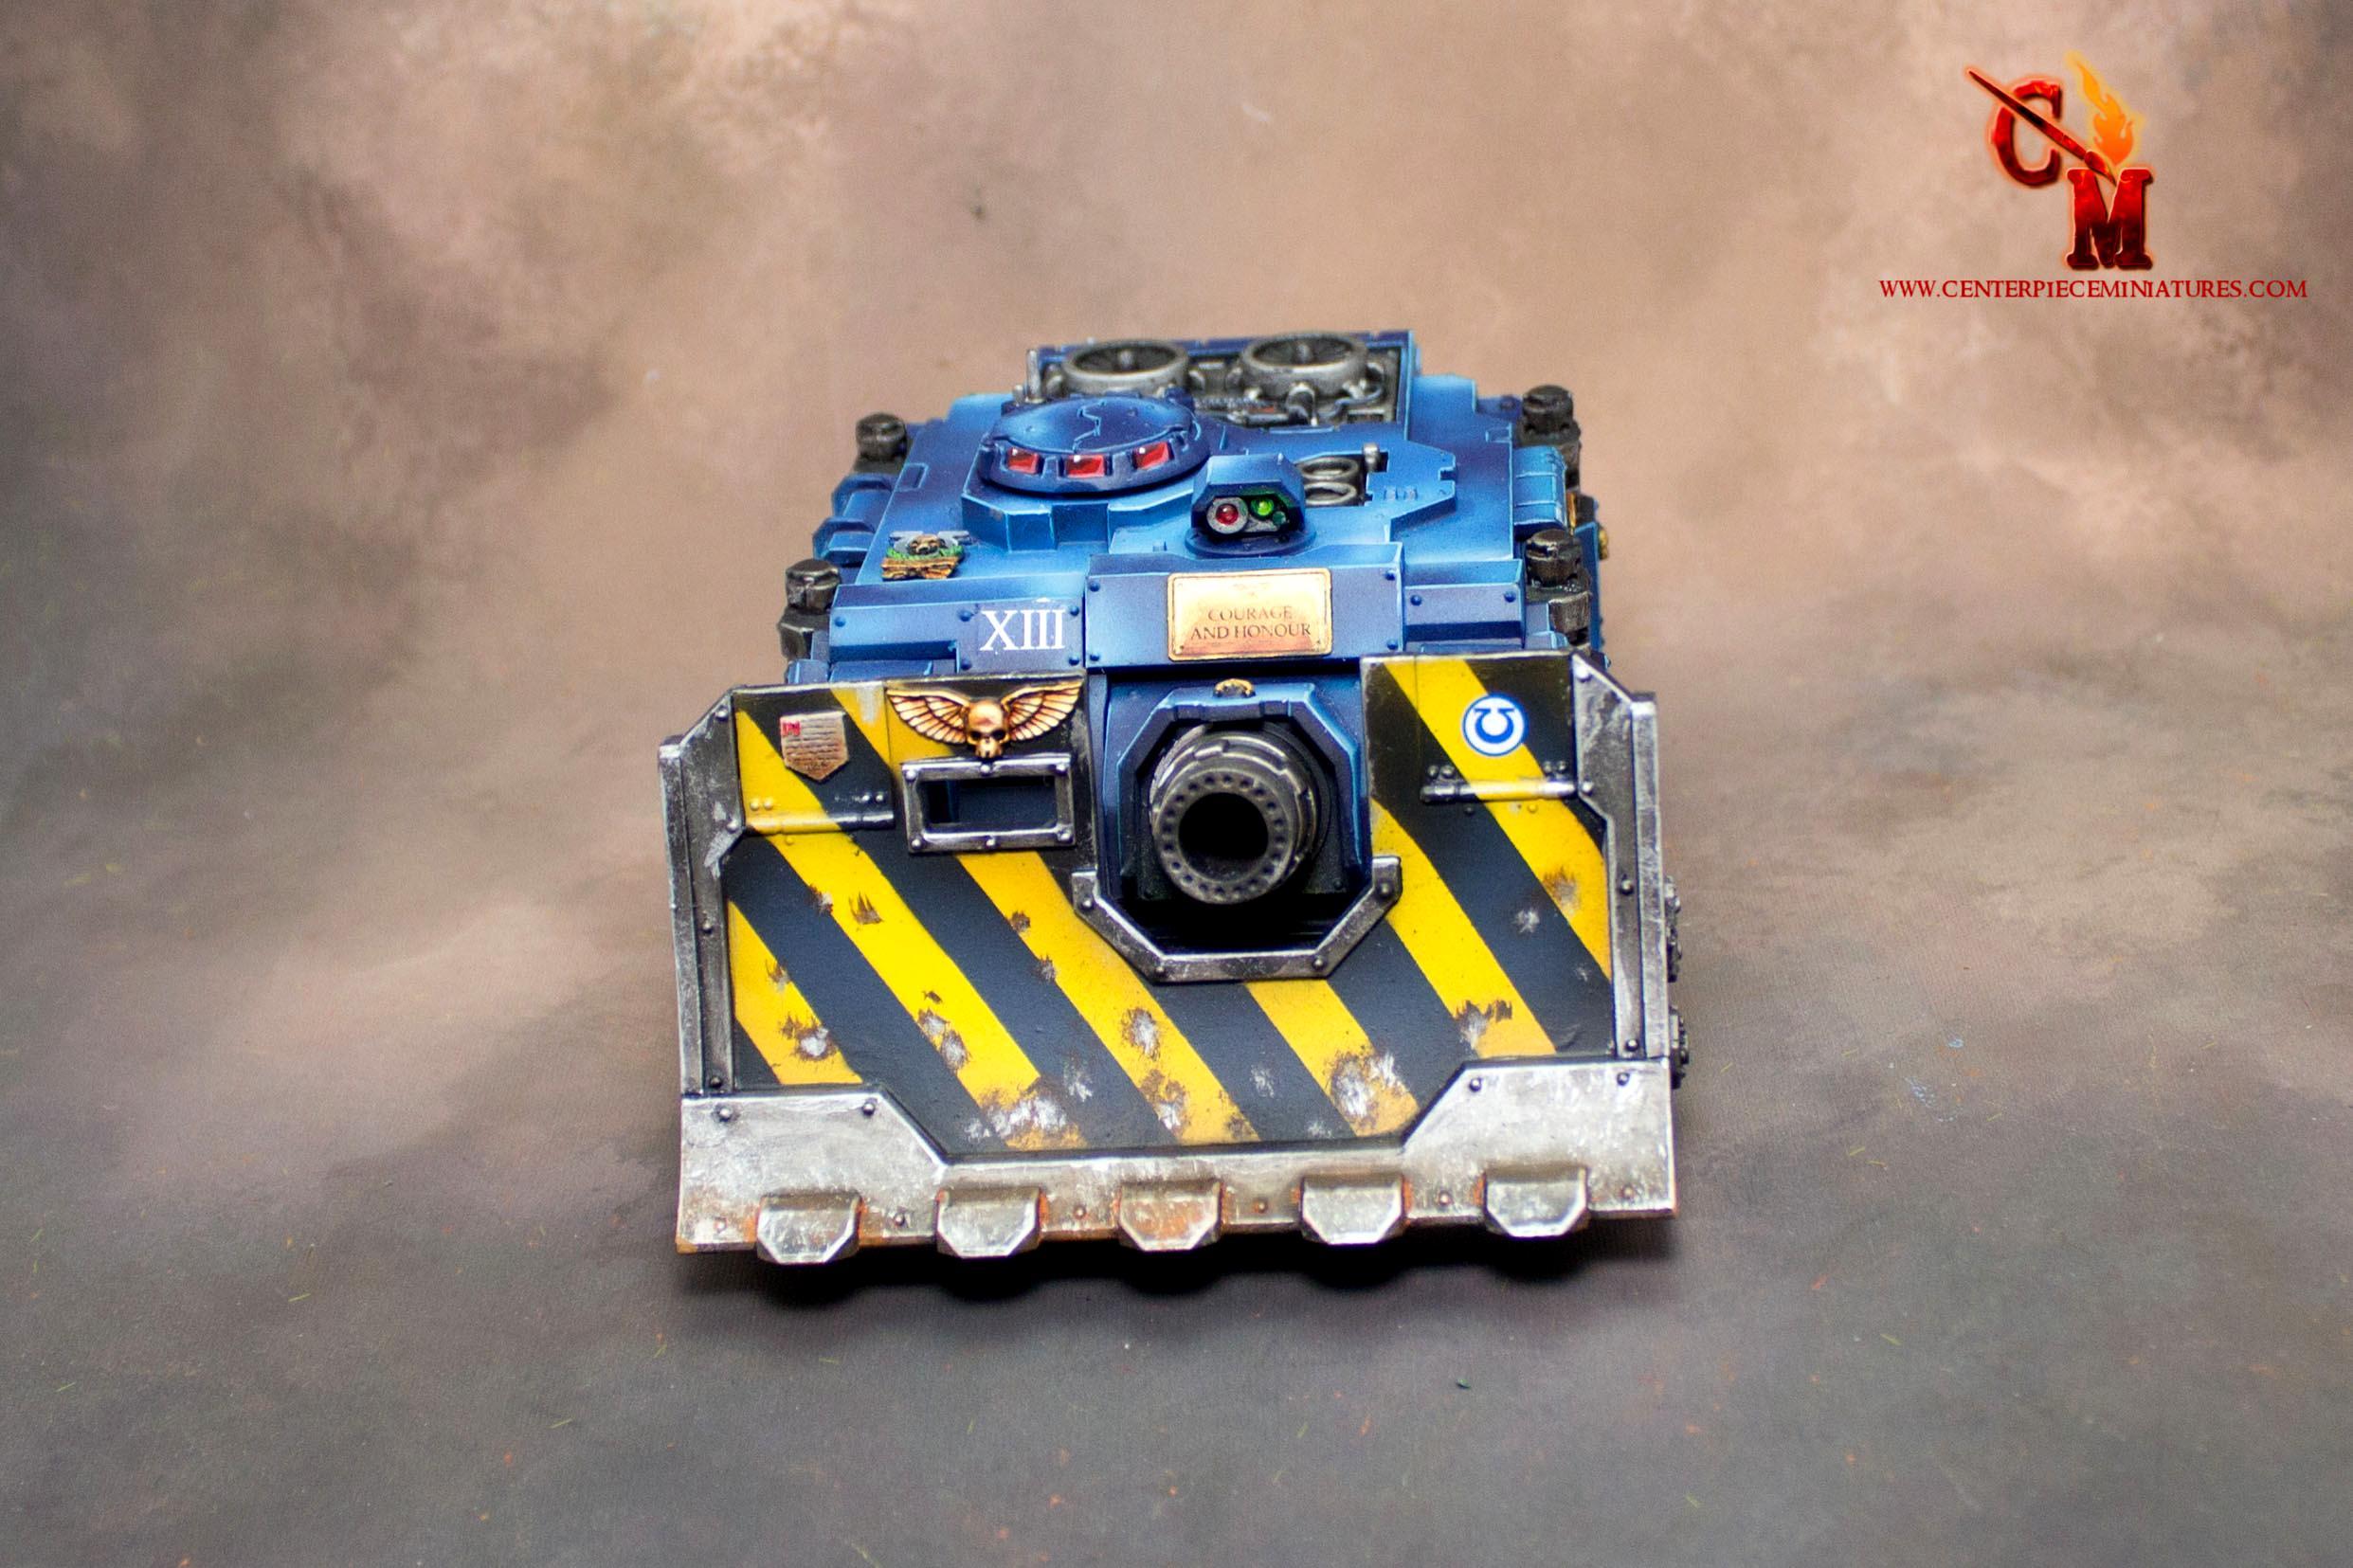 Pro-painted, Space Marines, Tank, Ultramarines, Vindicator